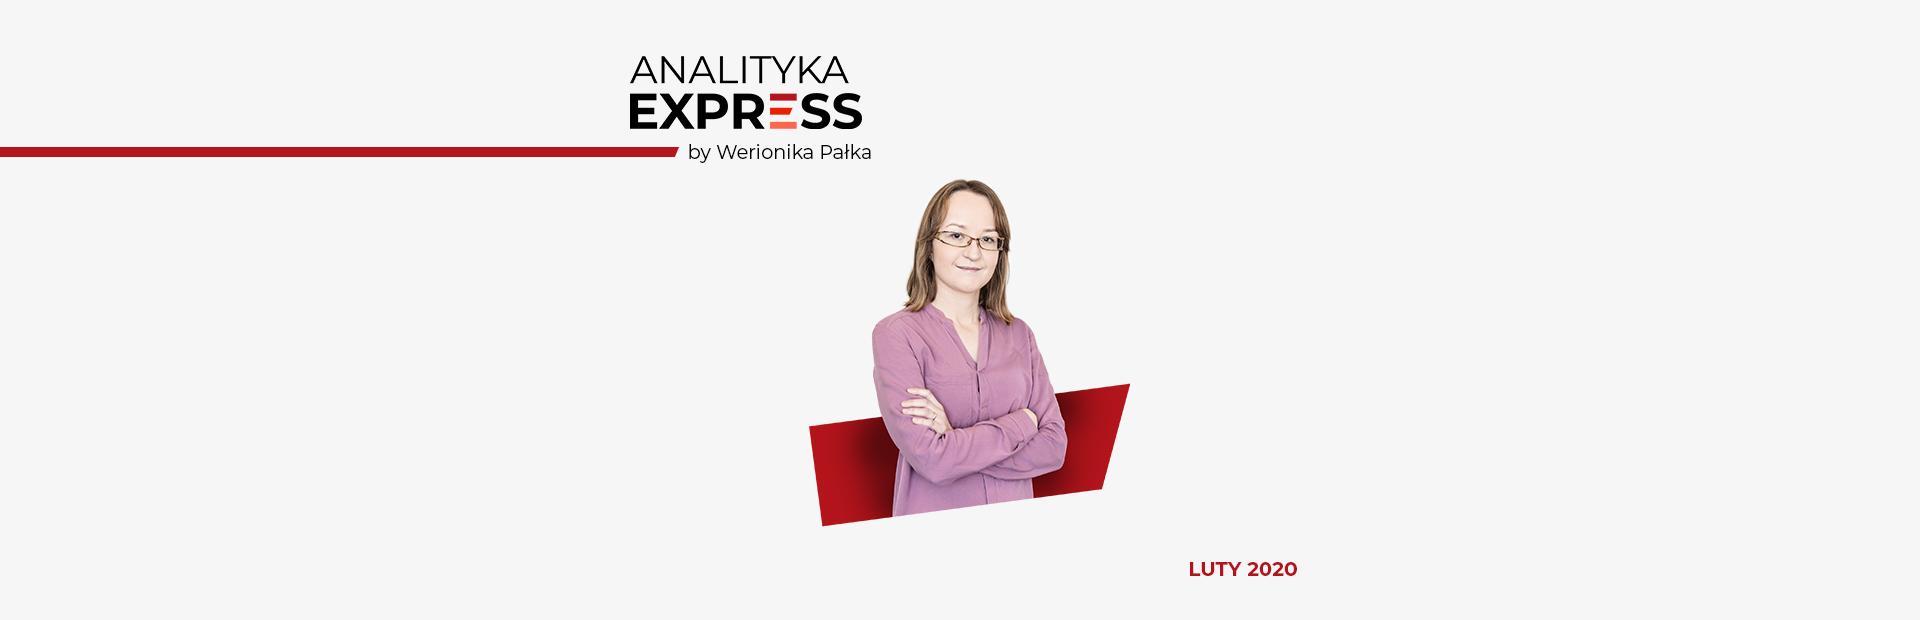 Analityka Express 2/2020